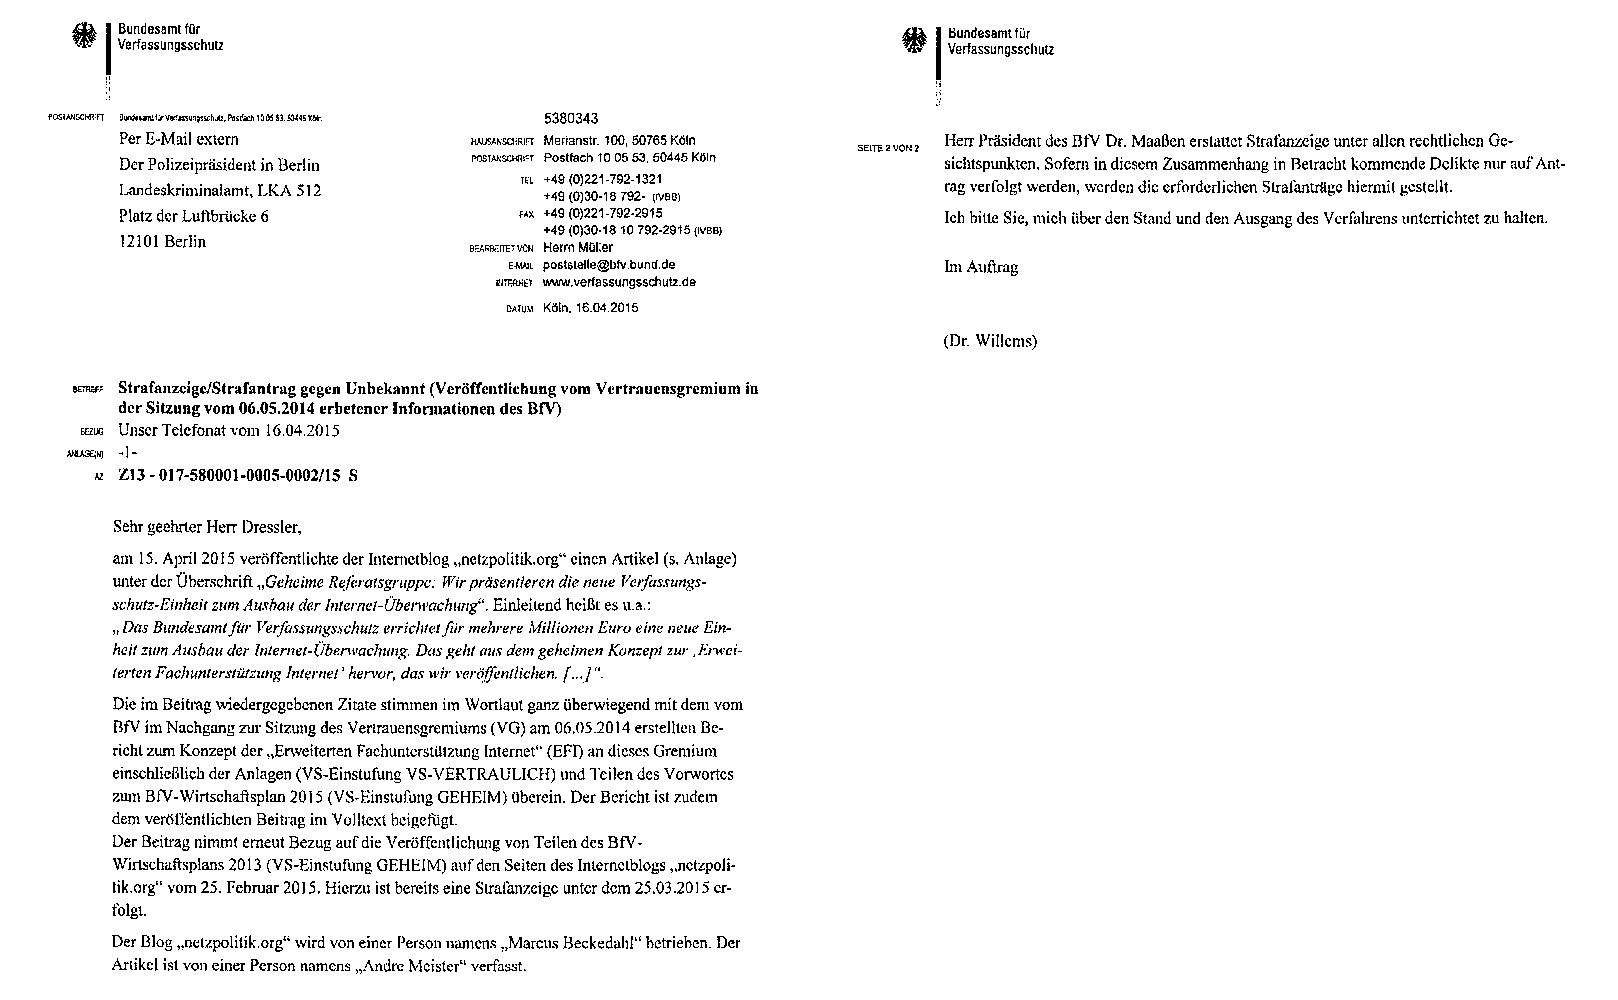 2015-04-16_BfV-LKA-Strafanzeige-Landesverrat